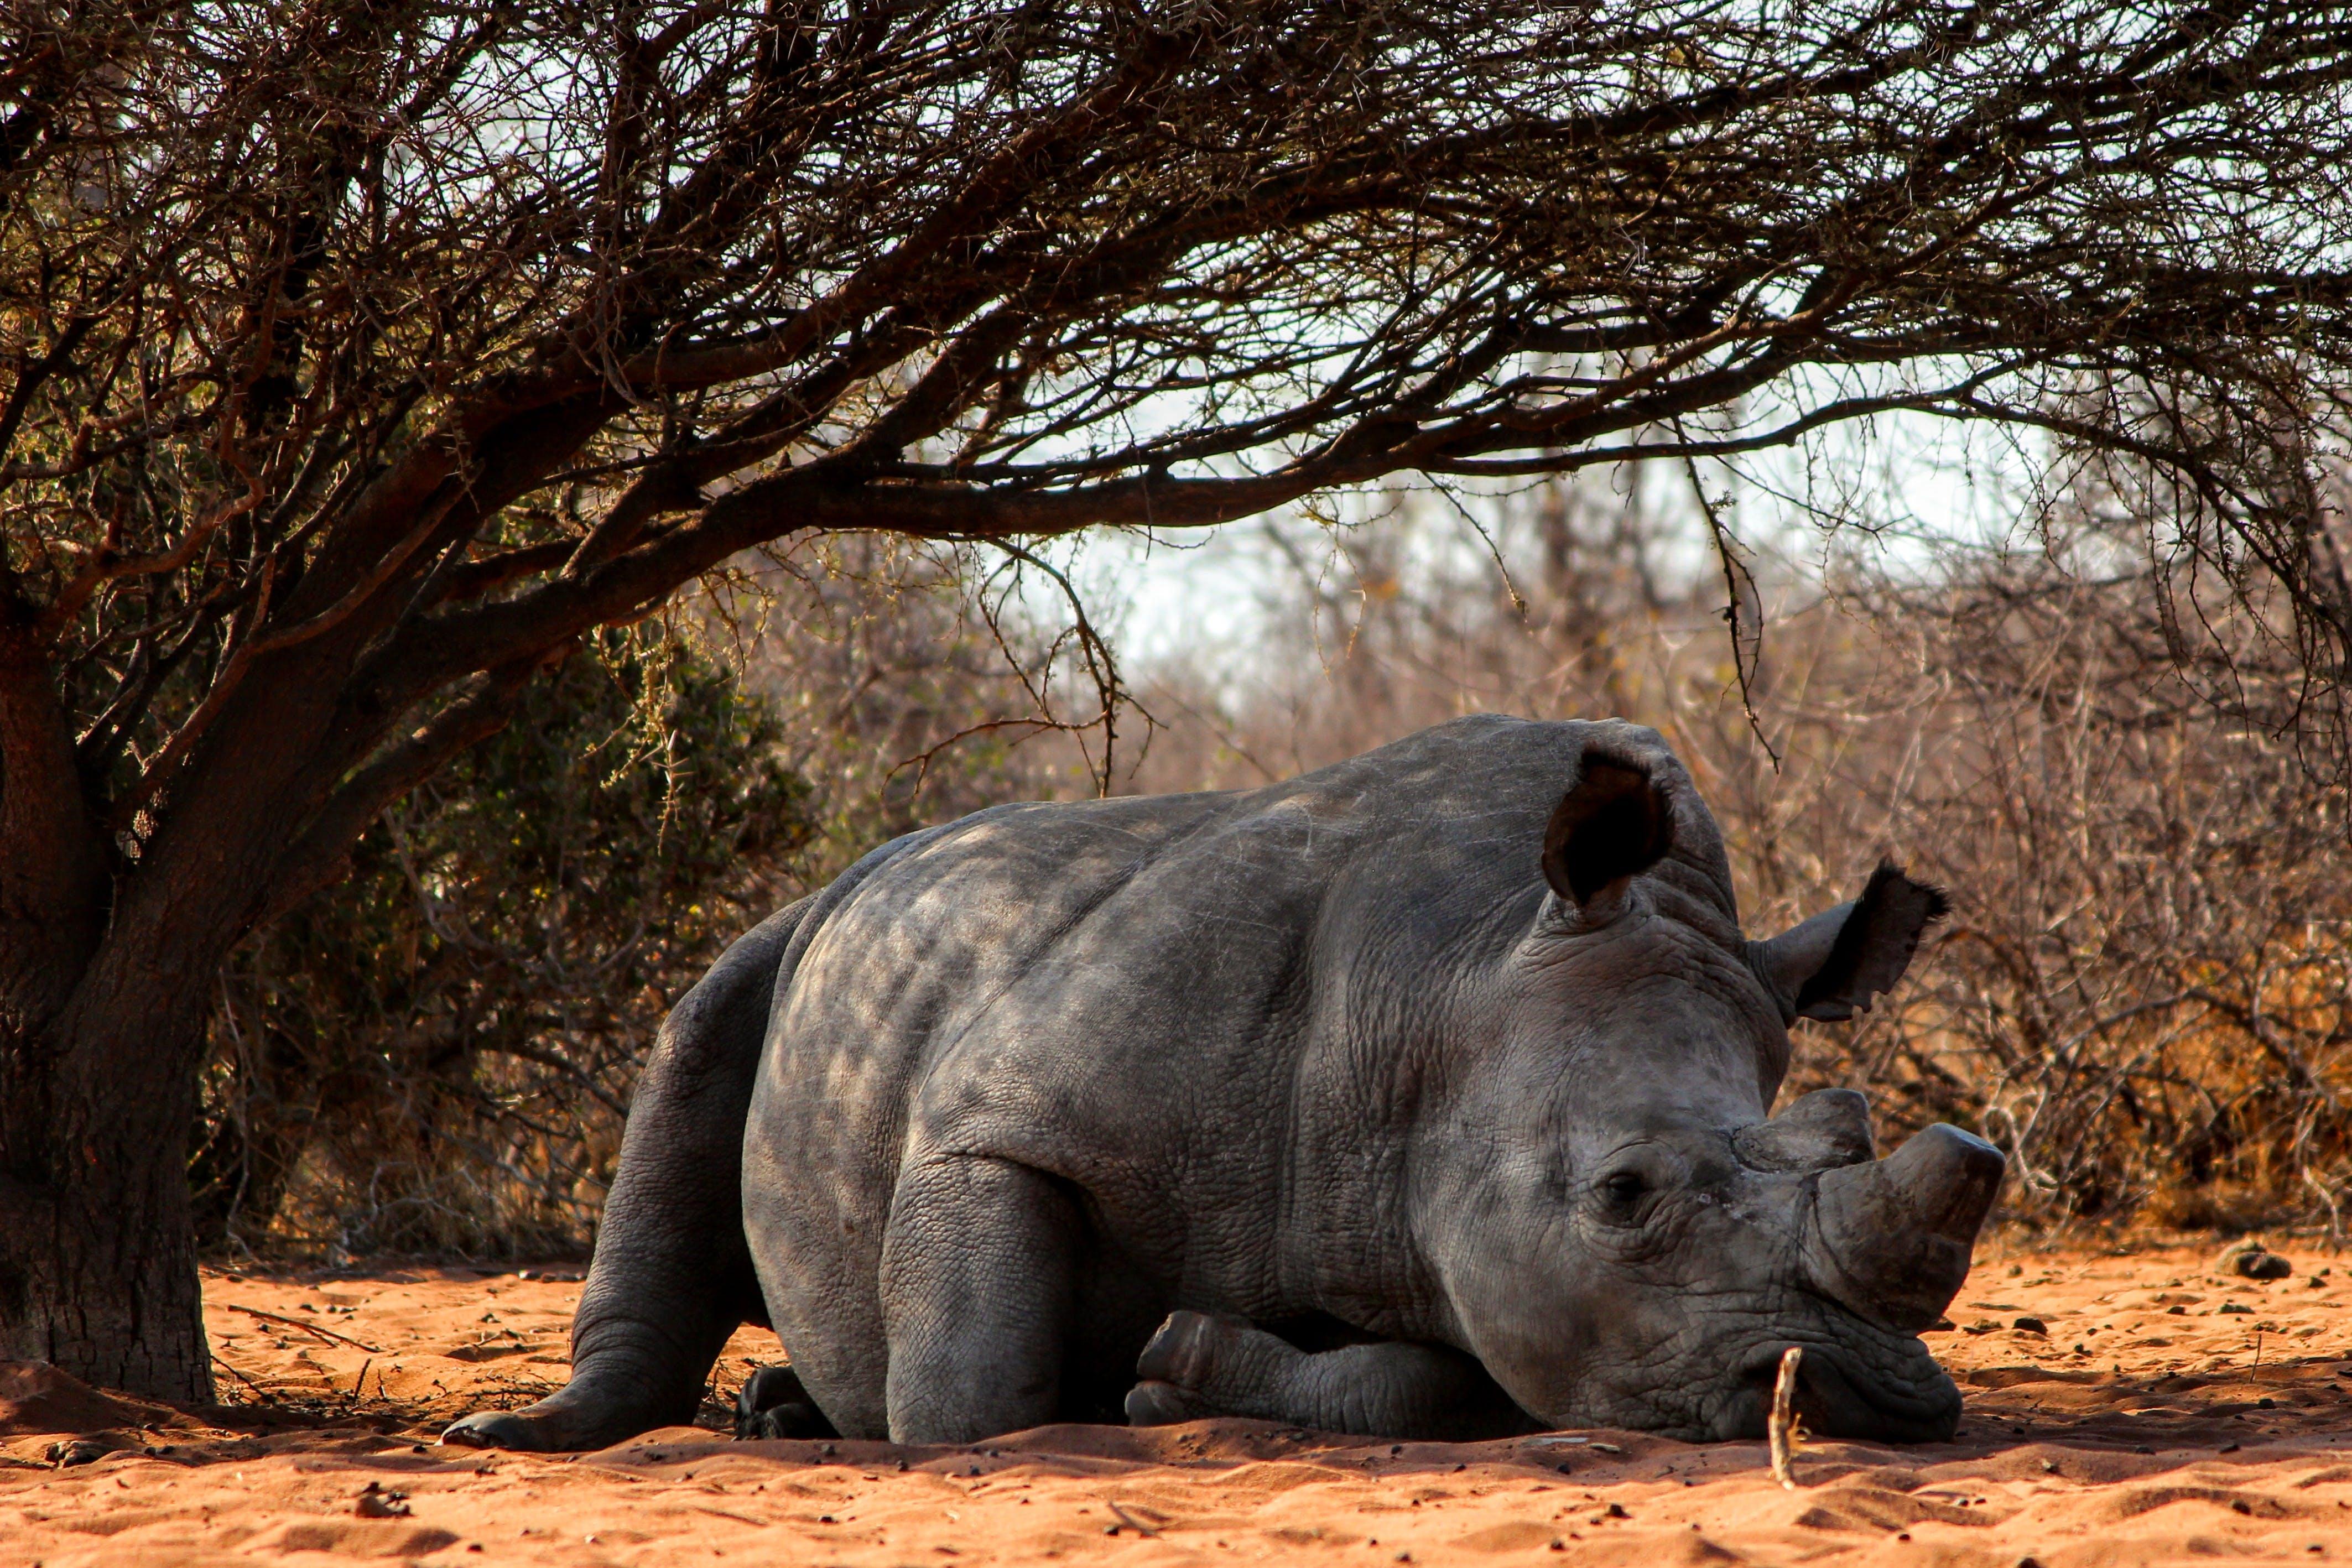 Rhino Lying on Ground Near Tree